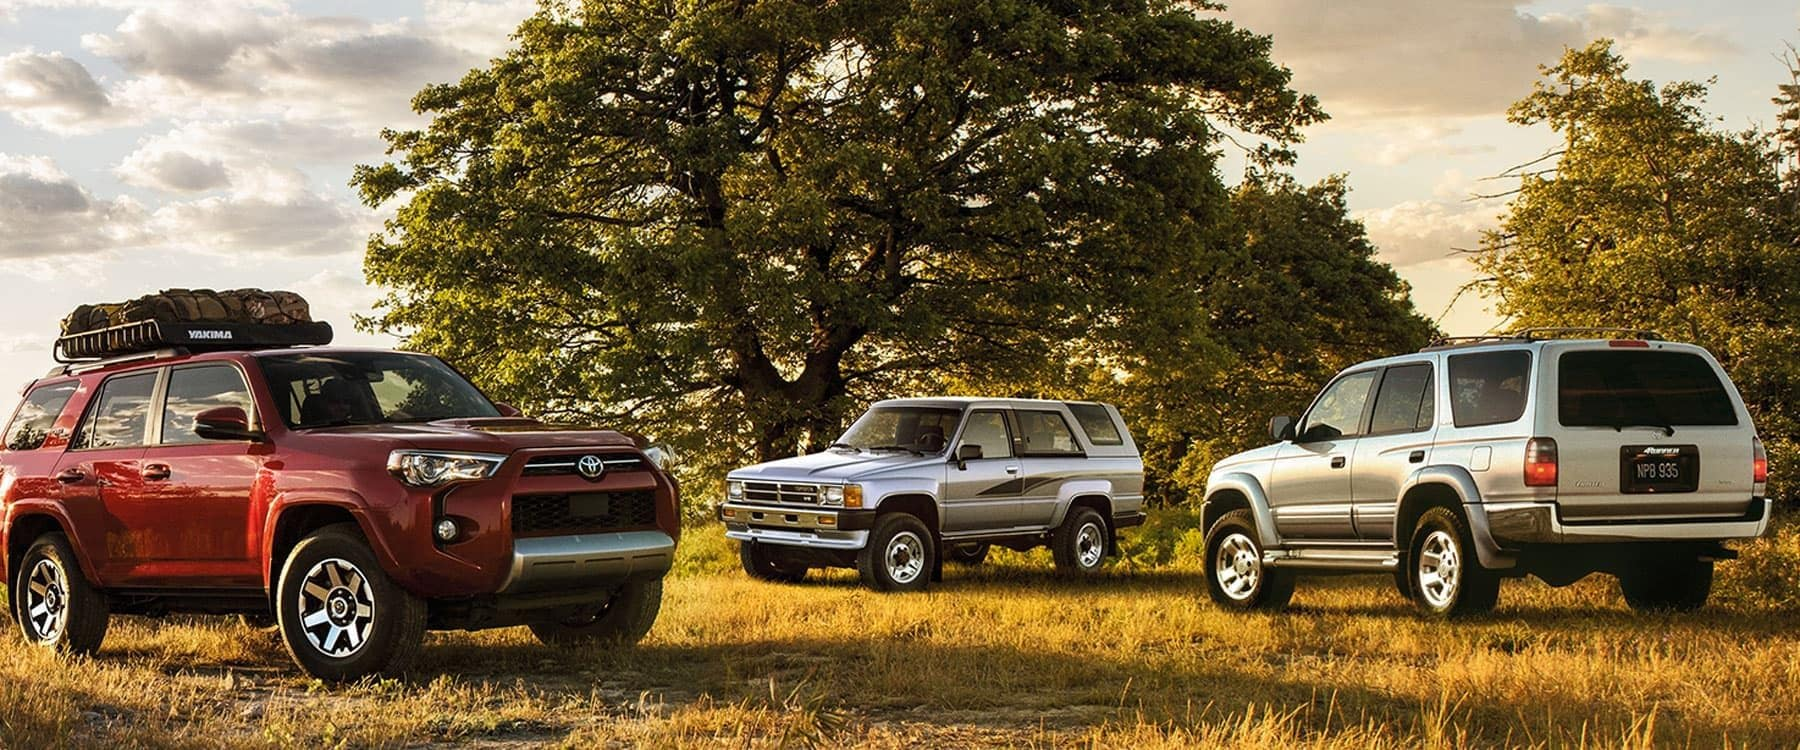 3 Toyota 4Runners sitting in an open field